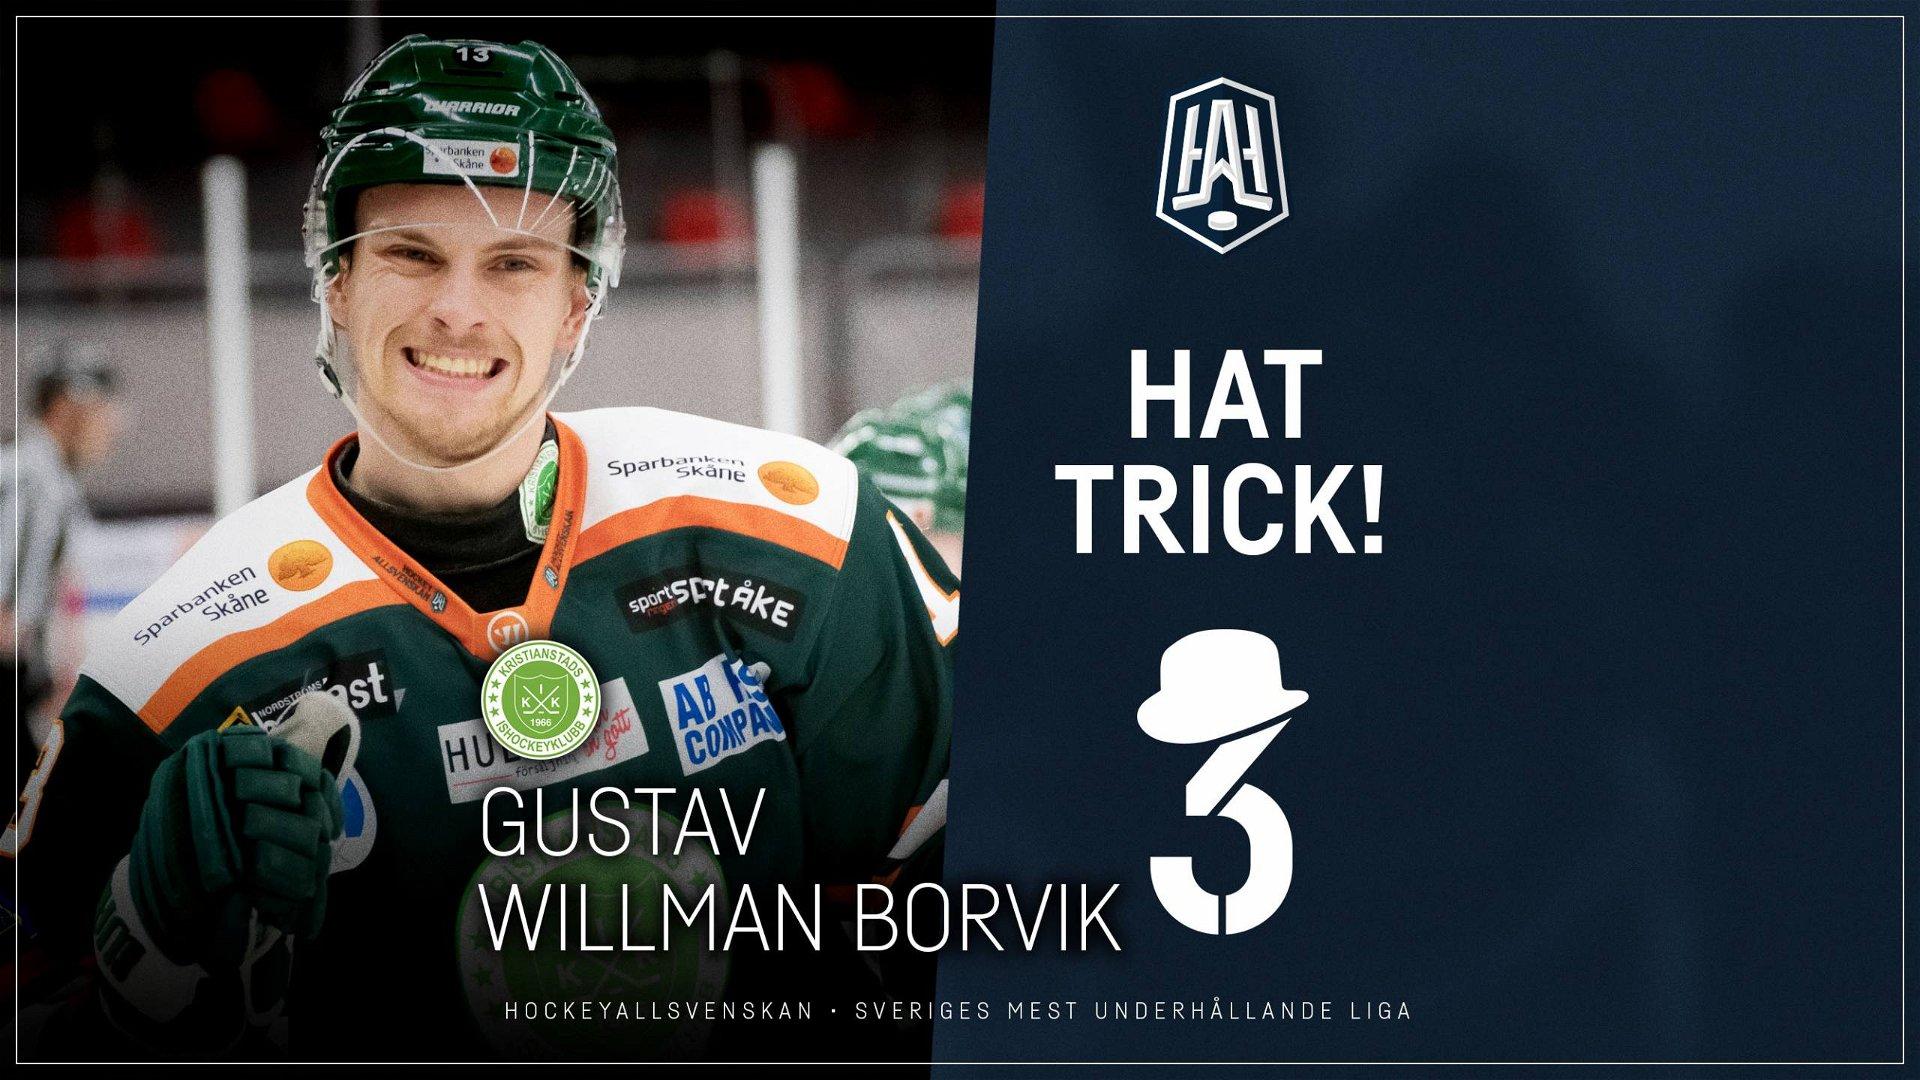 Hattrick: Gustav Willman Borvik, Kristianstad